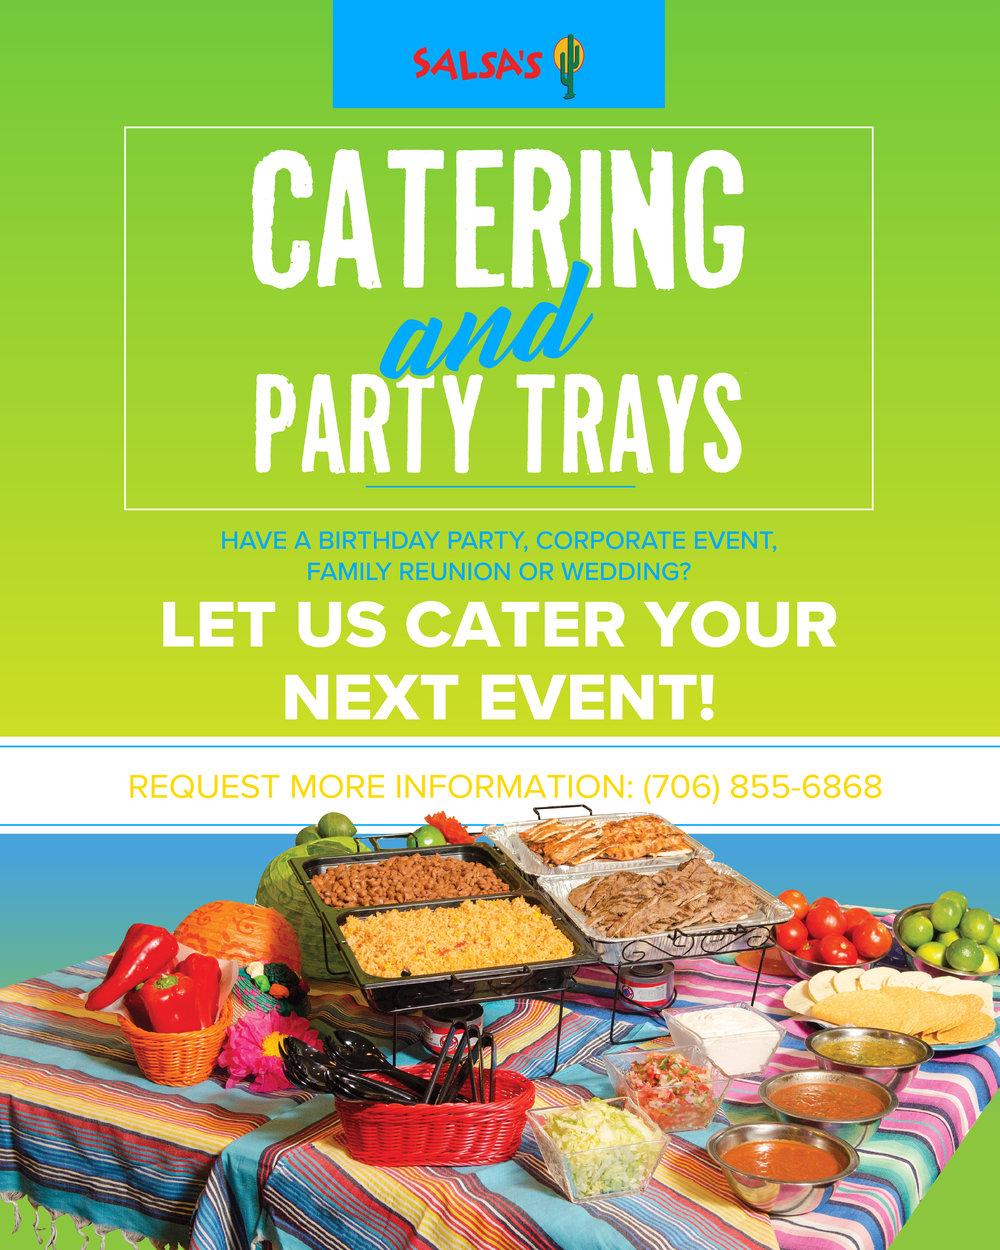 Catering Flyer 16 x 20-01.jpg